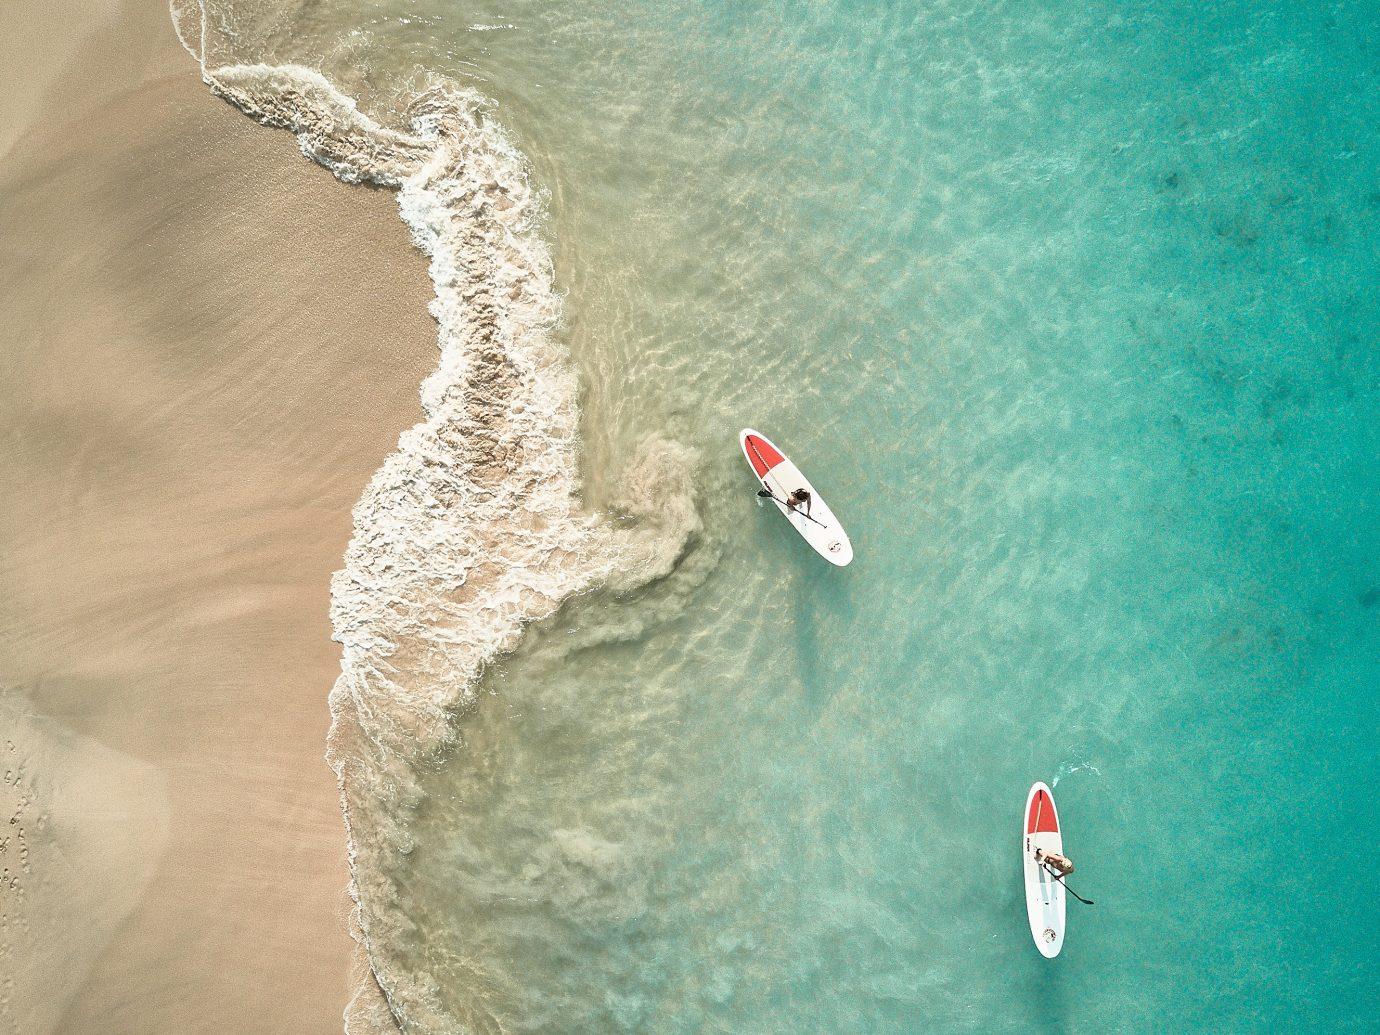 two people paddleboarding taken overhead